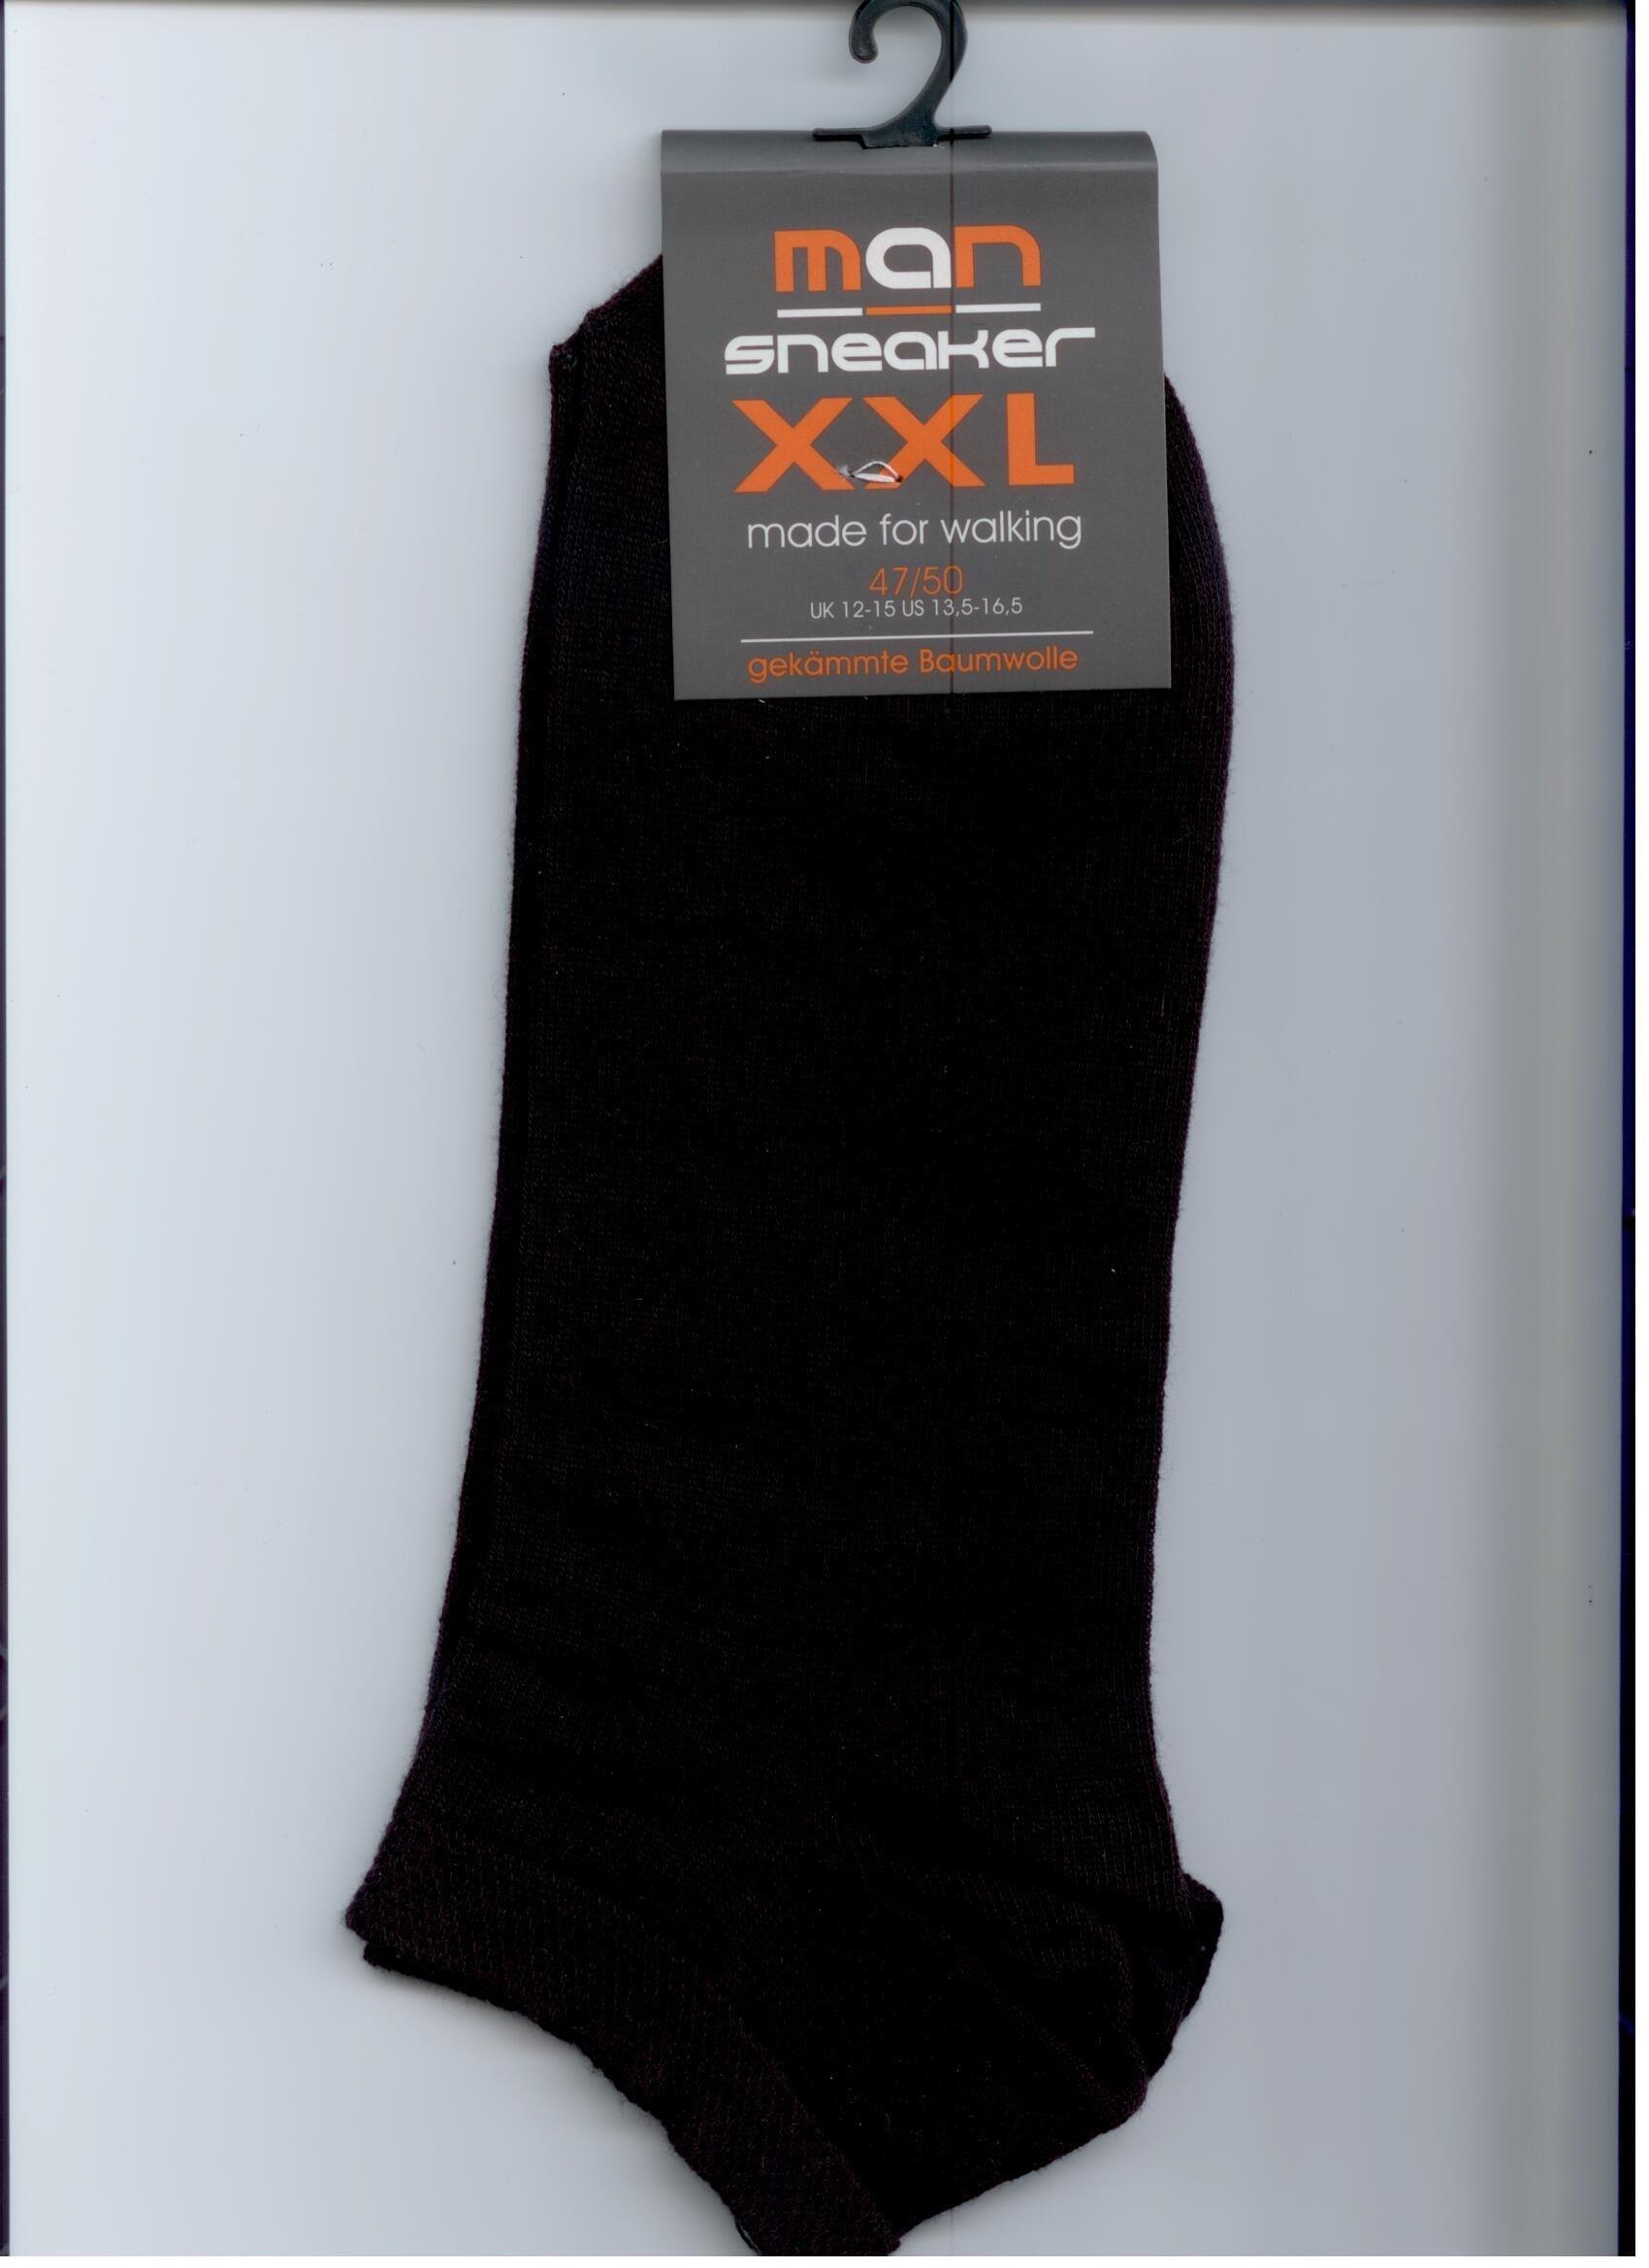 Herrensneakers XXL (4er Pack)